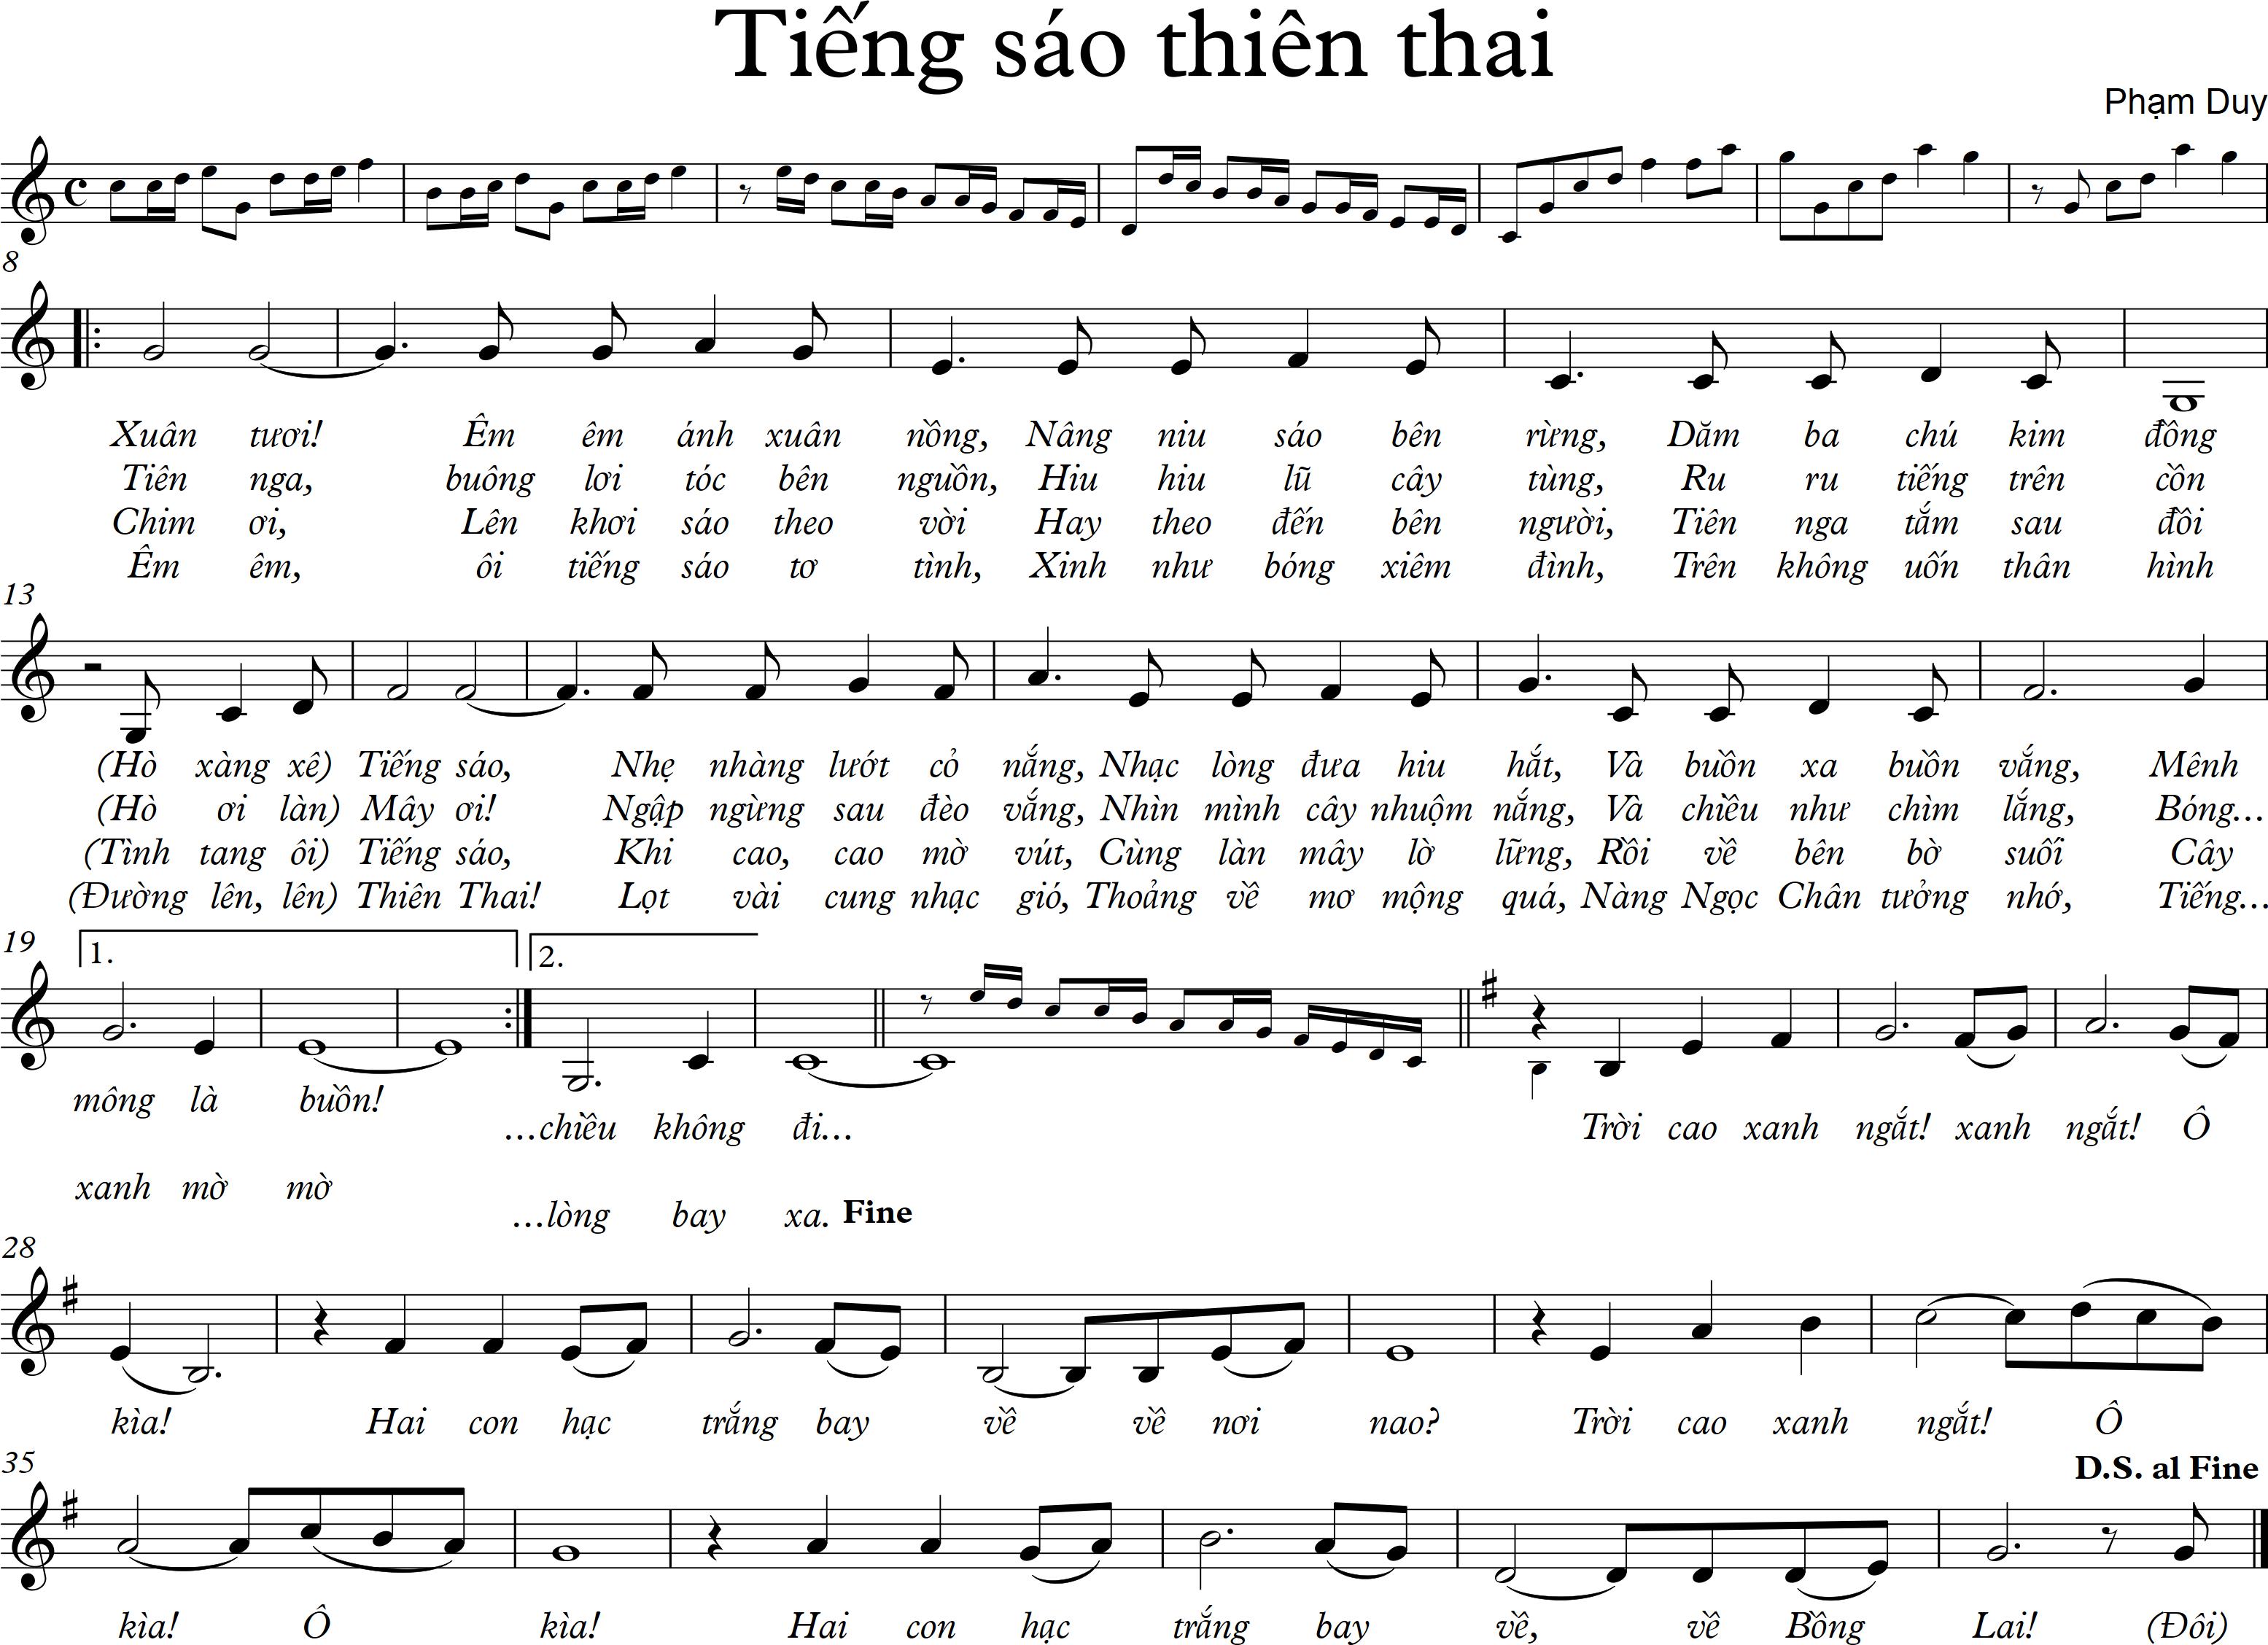 Tieng sao thien thai - no chords